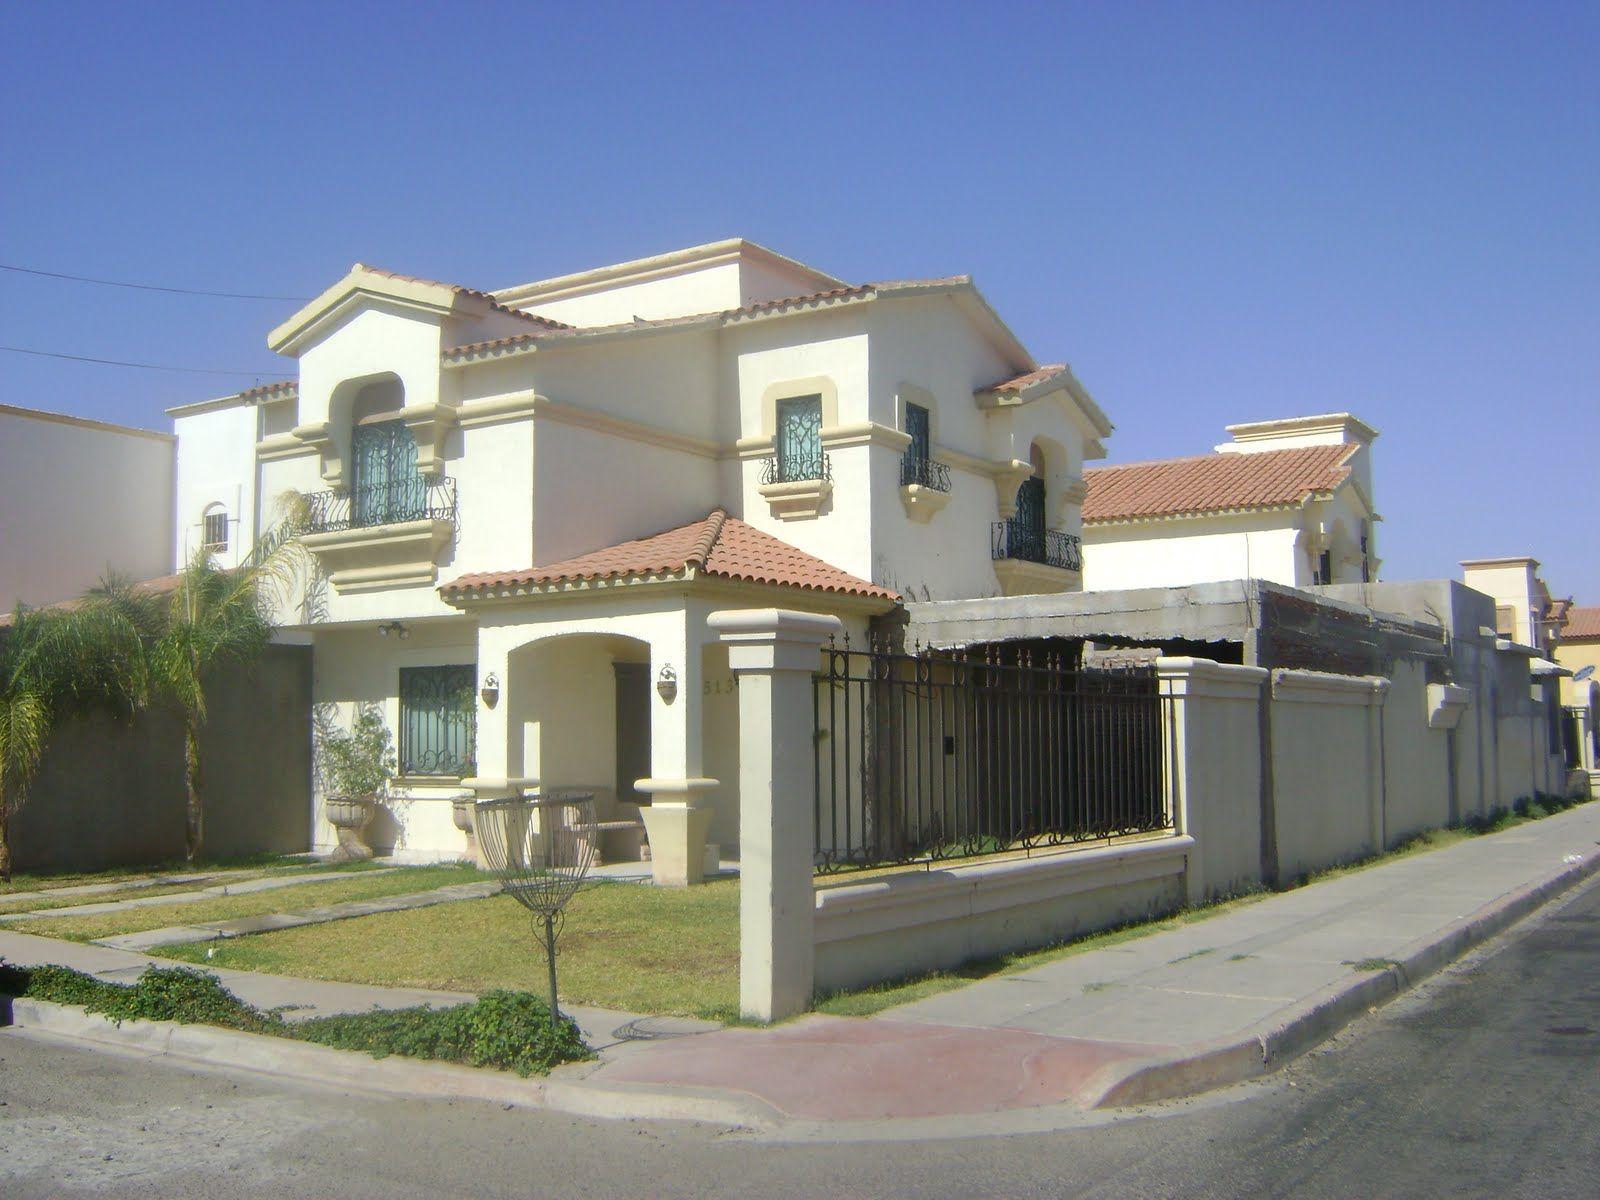 ventanas de casas bonitas buscar con google